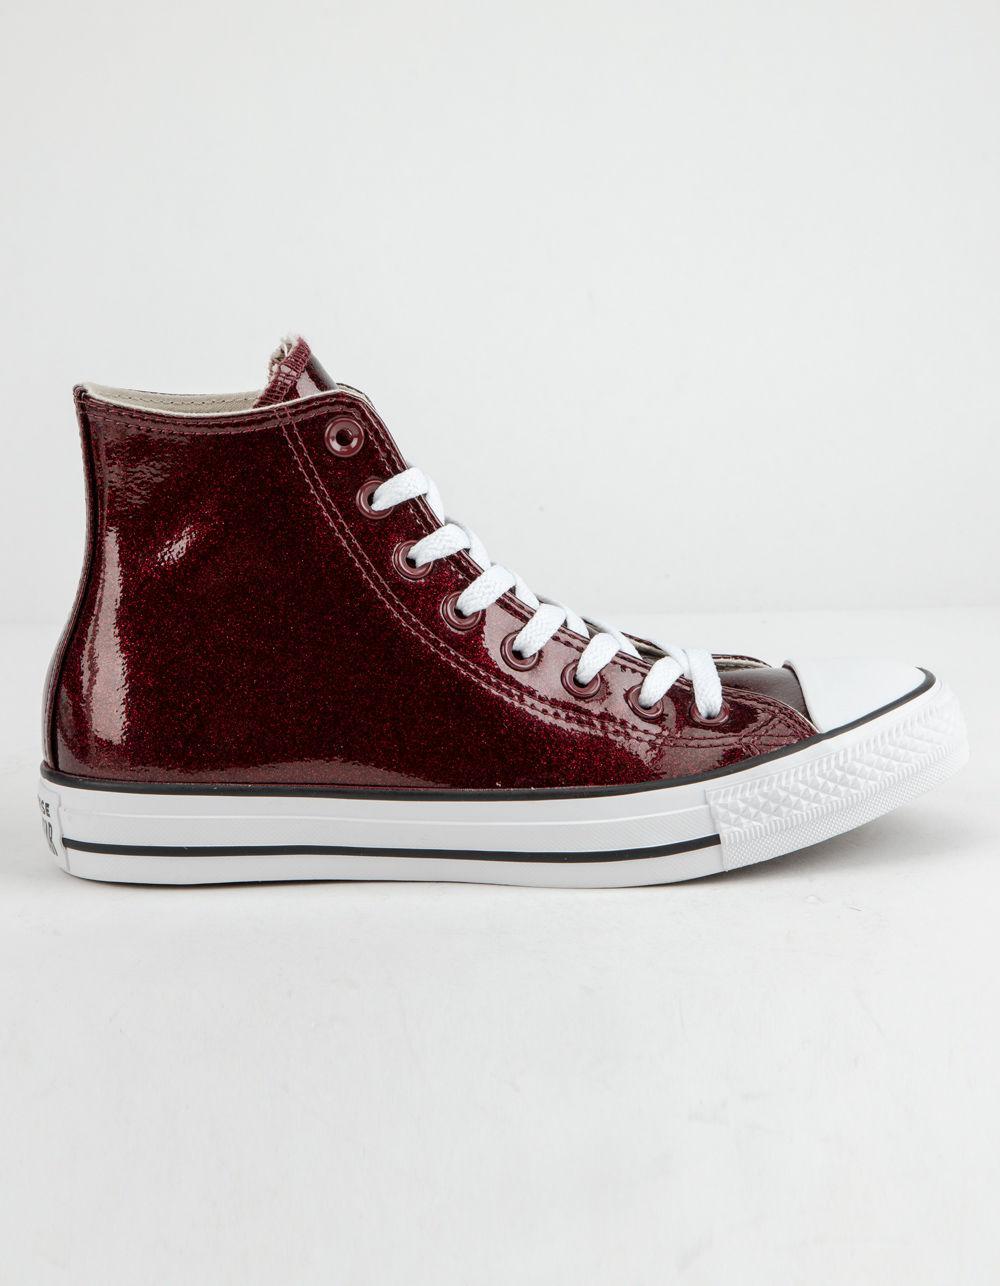 59bf3386eb15 Converse. Chuck Taylor All Star Wonderworld Dark Burgundy High Top Womens  Shoes